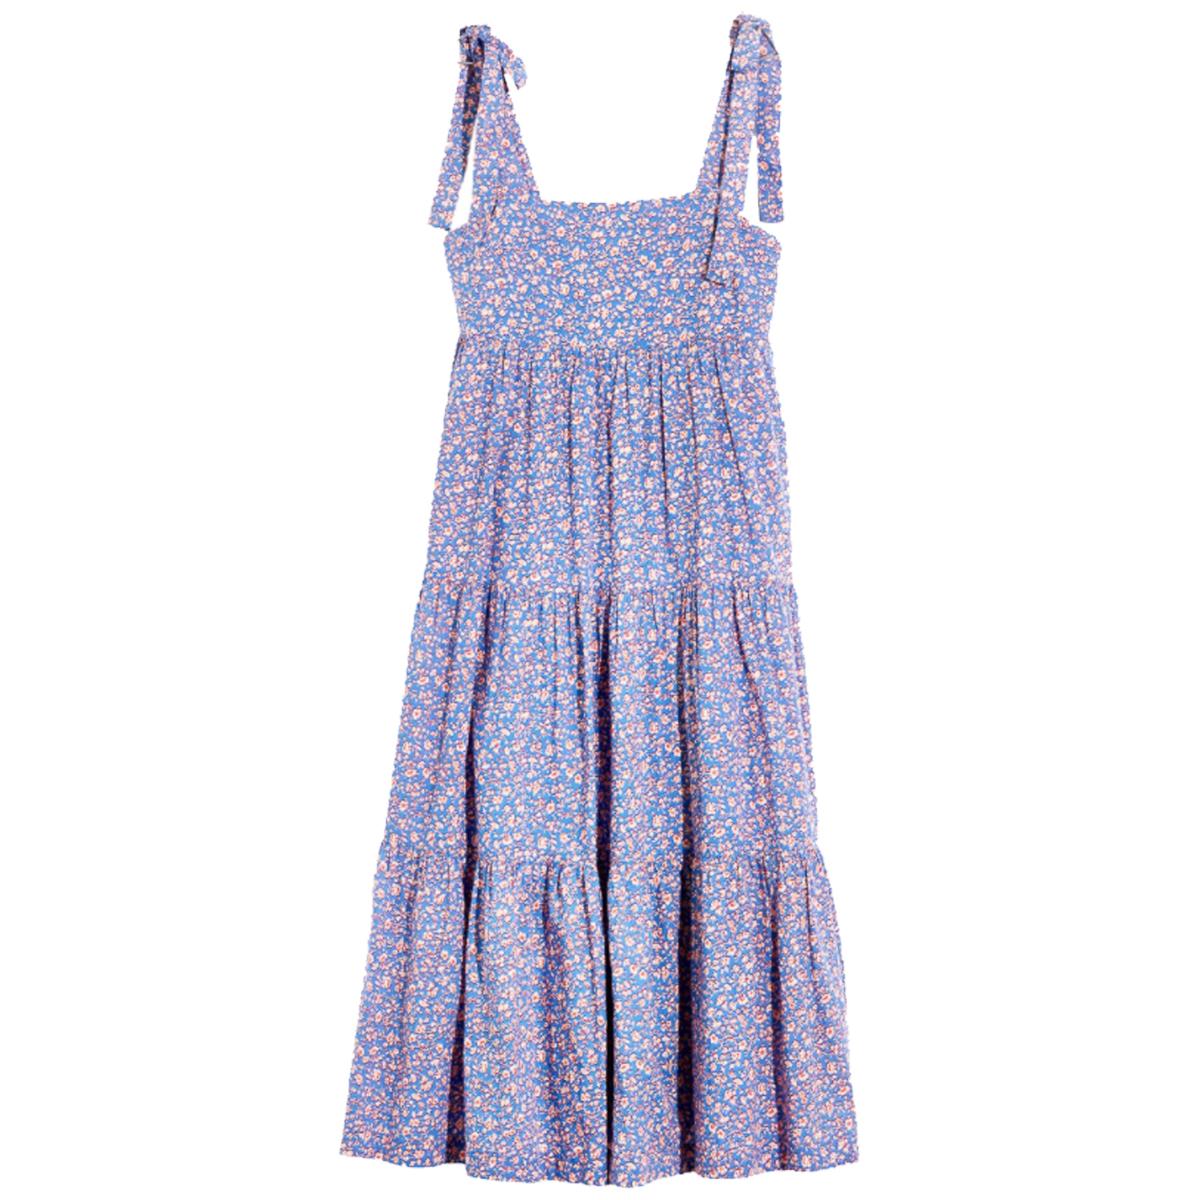 a chic dress